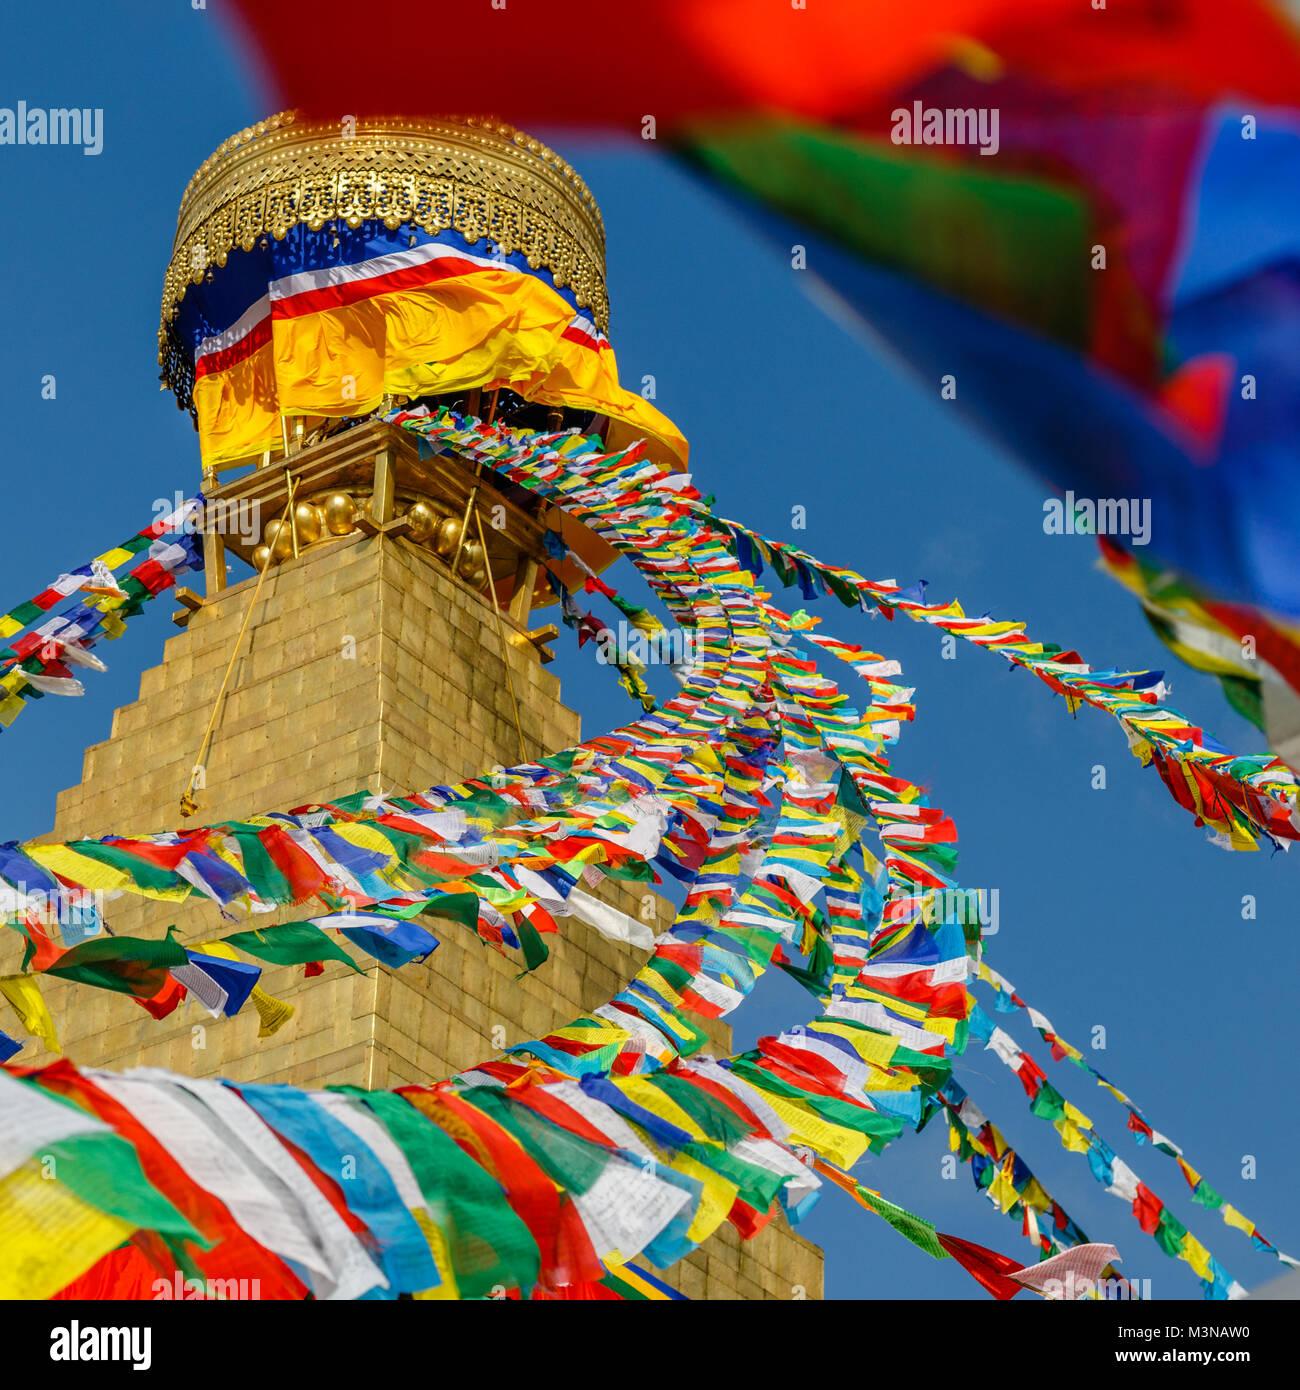 Boudhanath stupa with prayer flags, Kathmandu, Nepal. Square image. - Stock Image